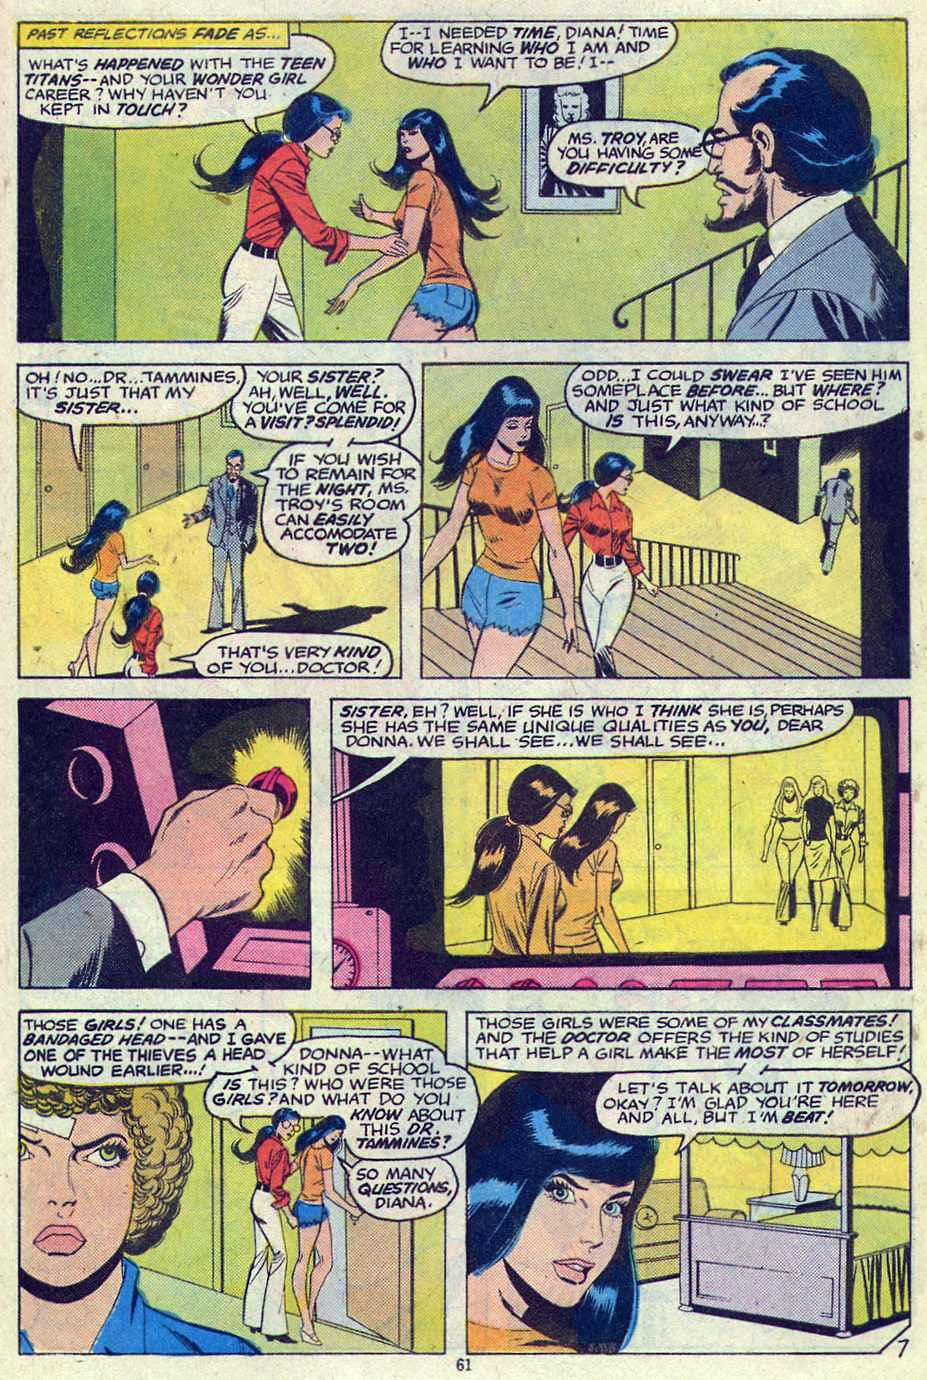 Read online Adventure Comics (1938) comic -  Issue #461 - 61